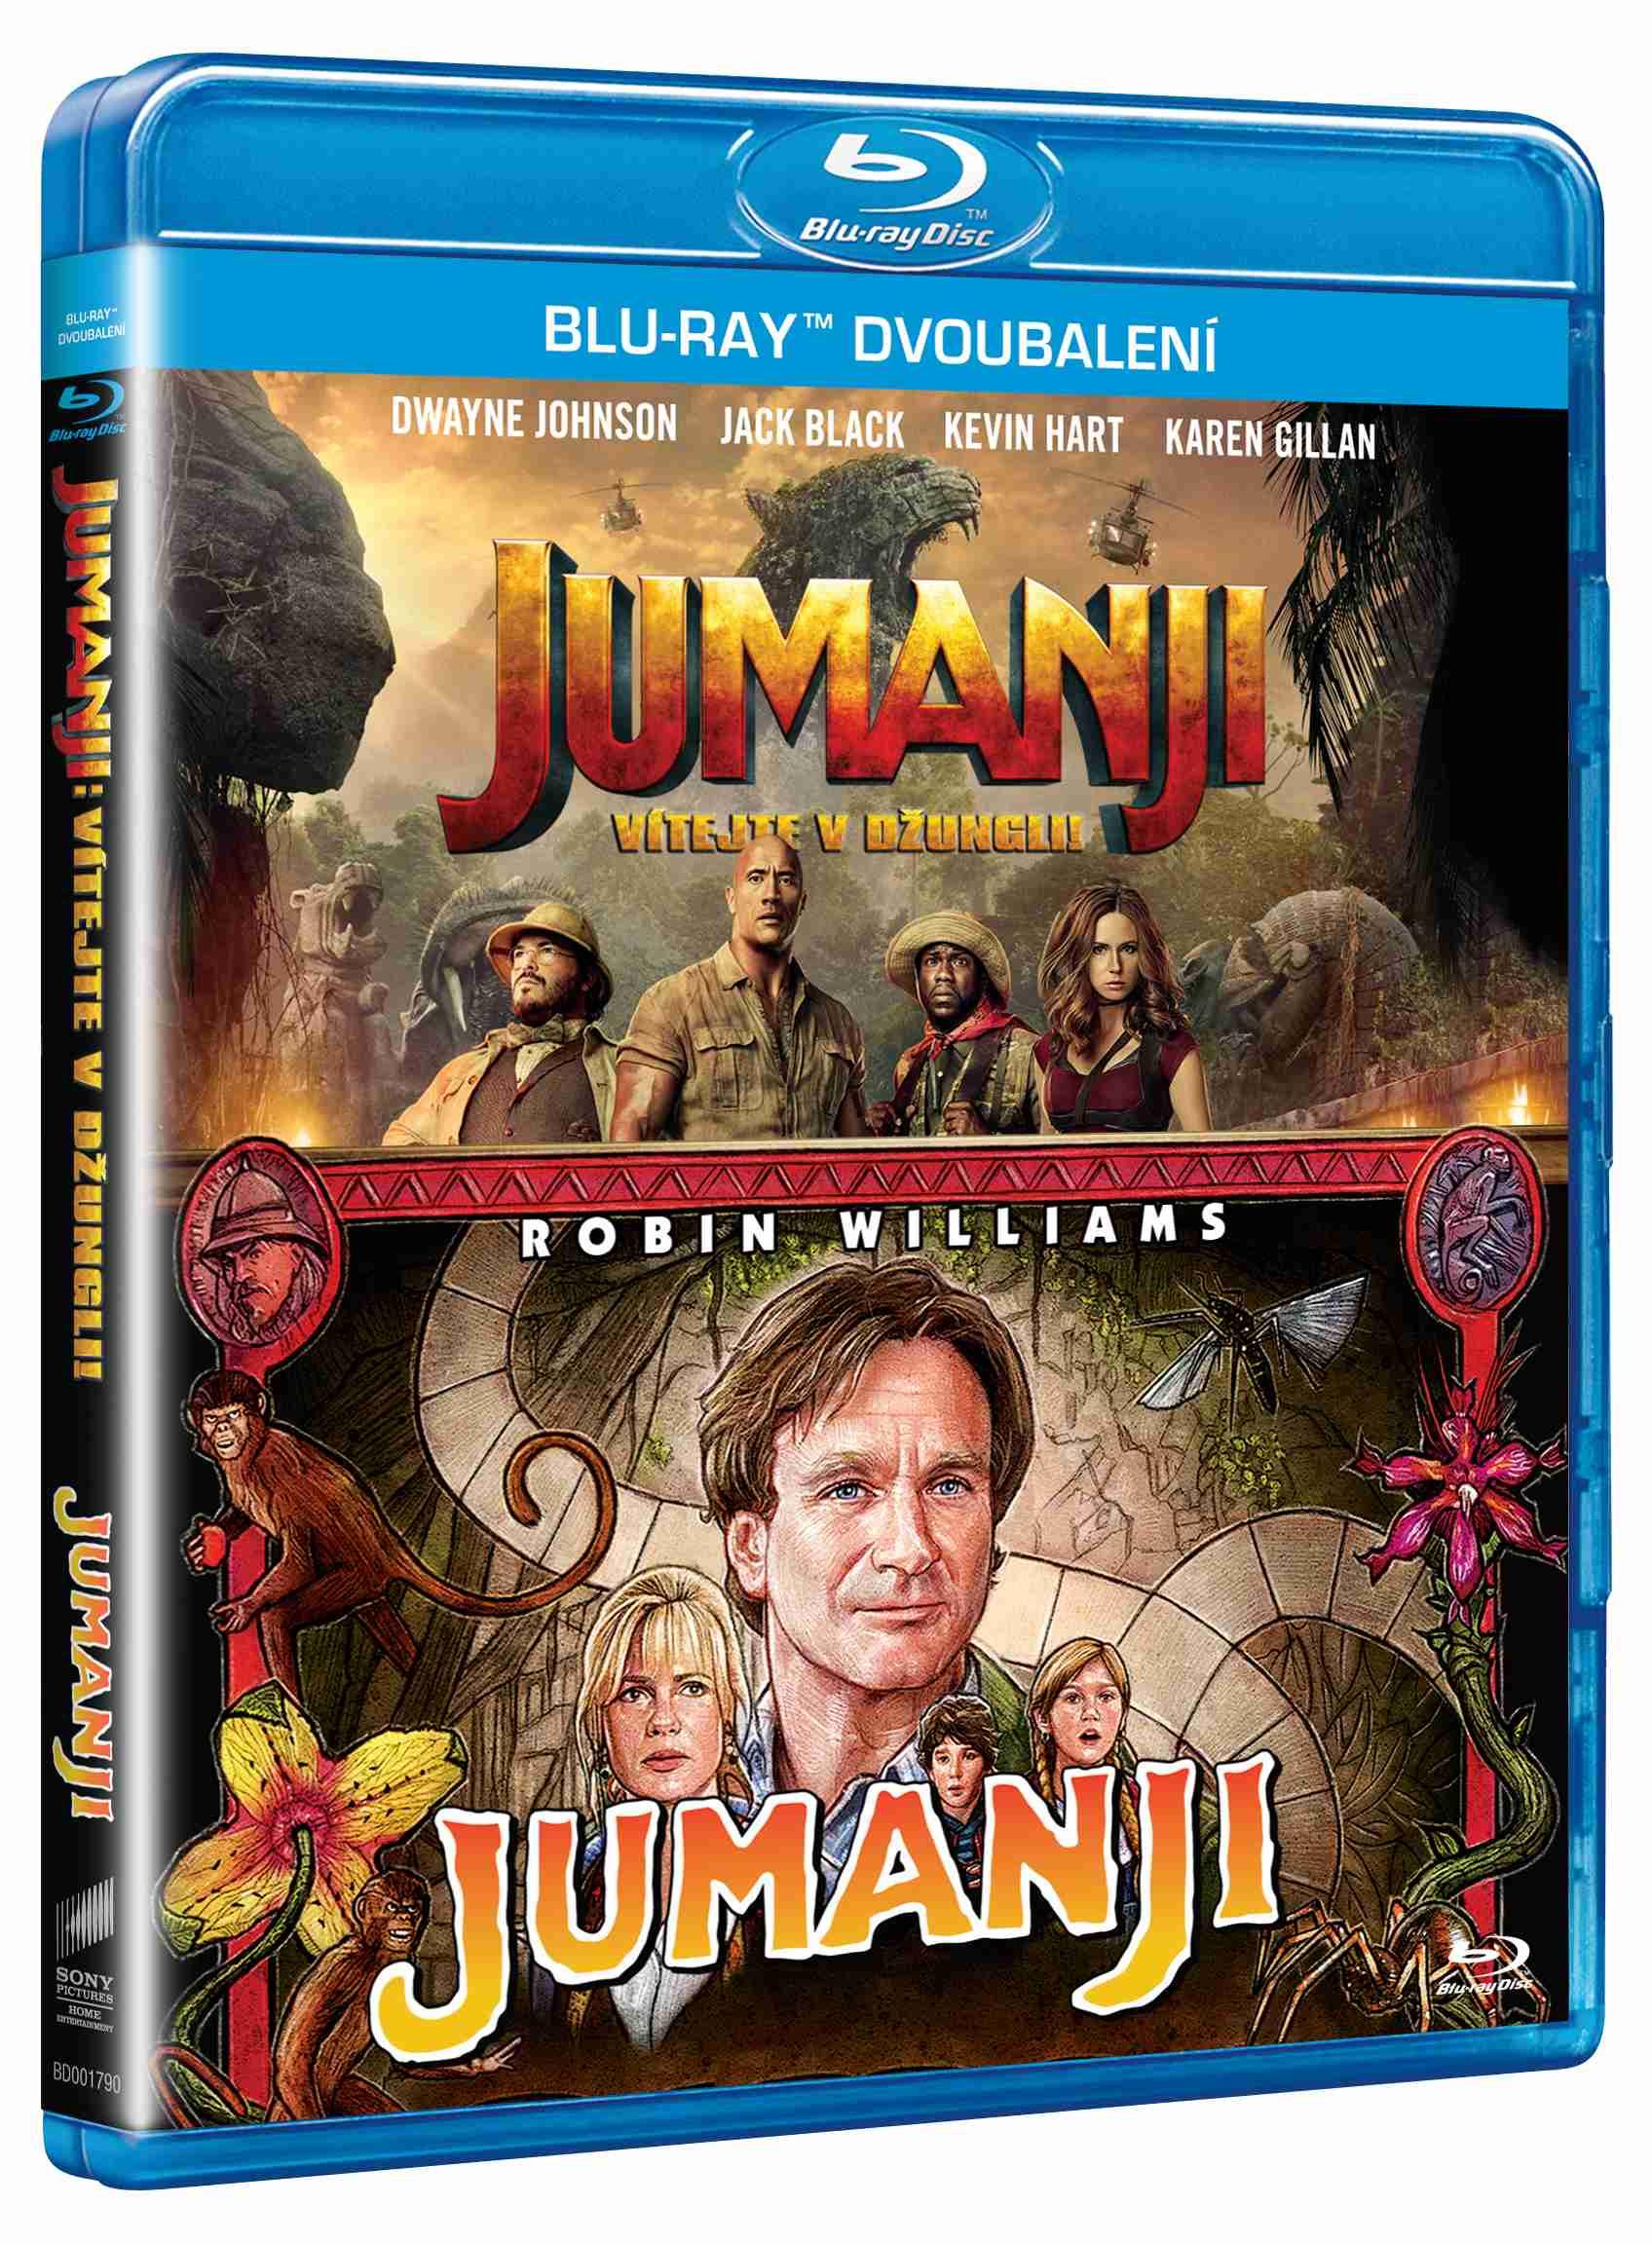 Jumanji 1+2 kolekce - Blu-ray (2 BD)